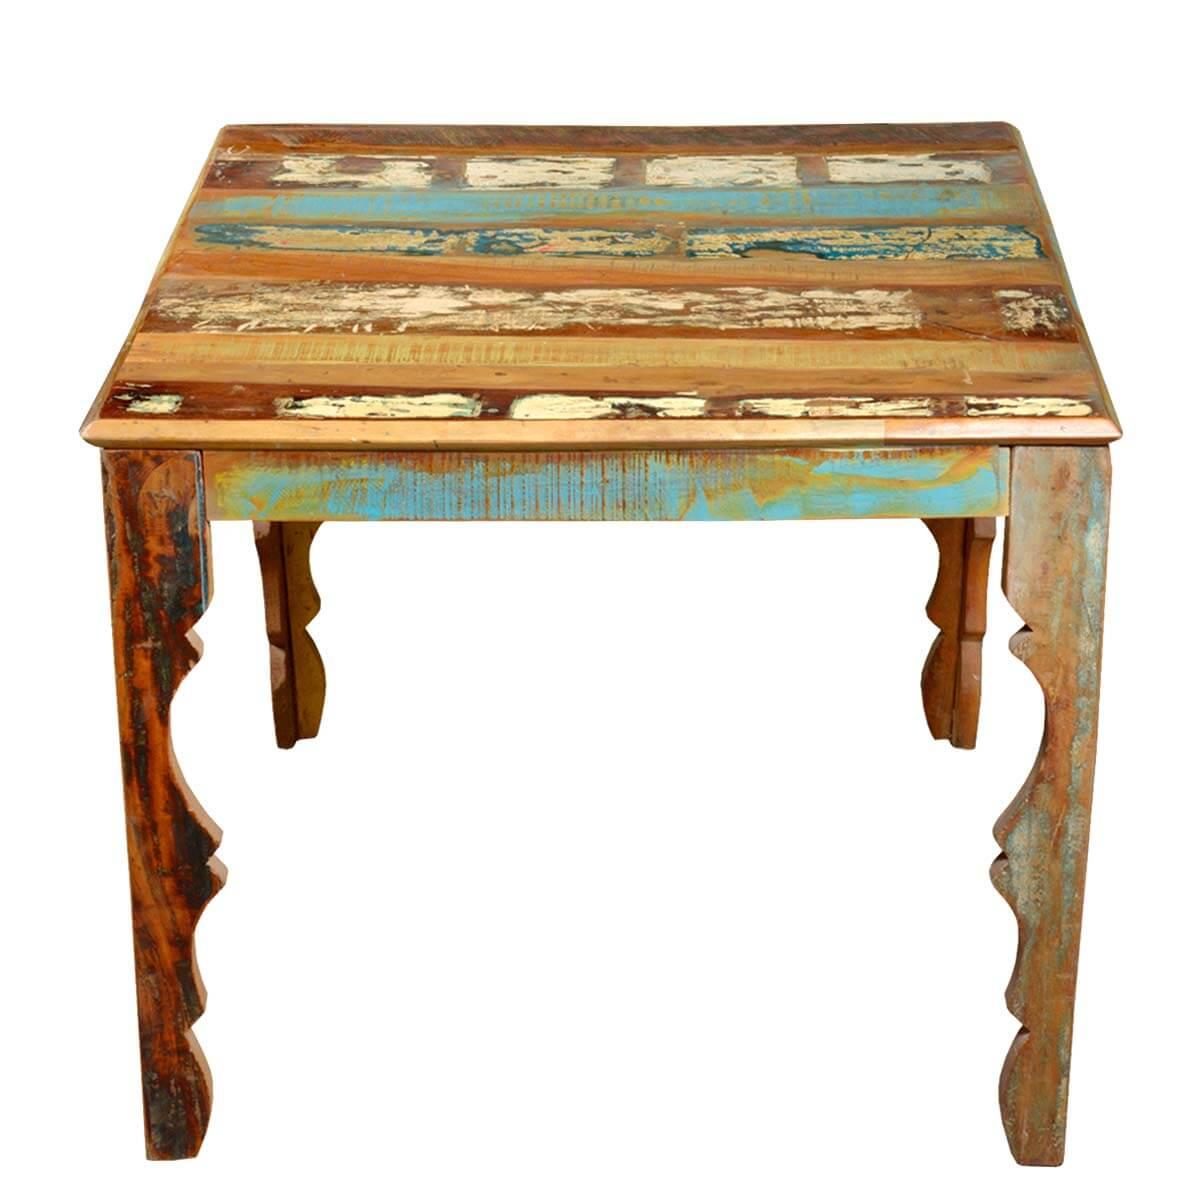 Decorative Wood Table Legs